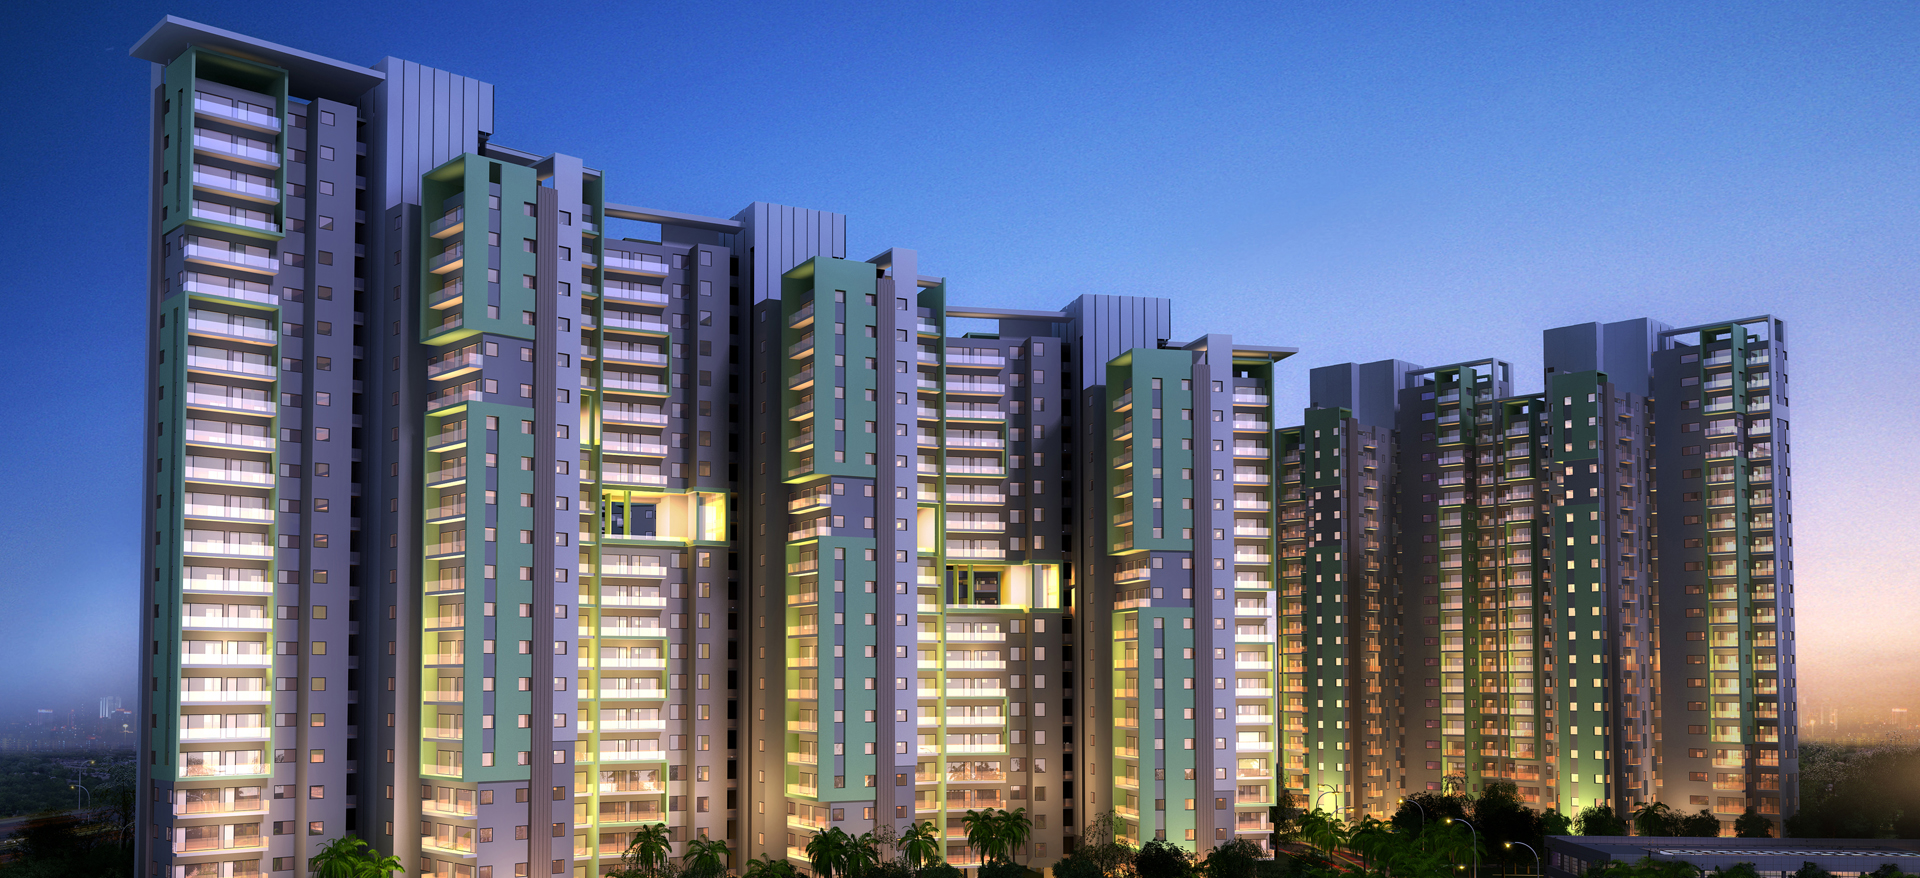 Sector M Group Housing Development, Uttar Pradesh, India